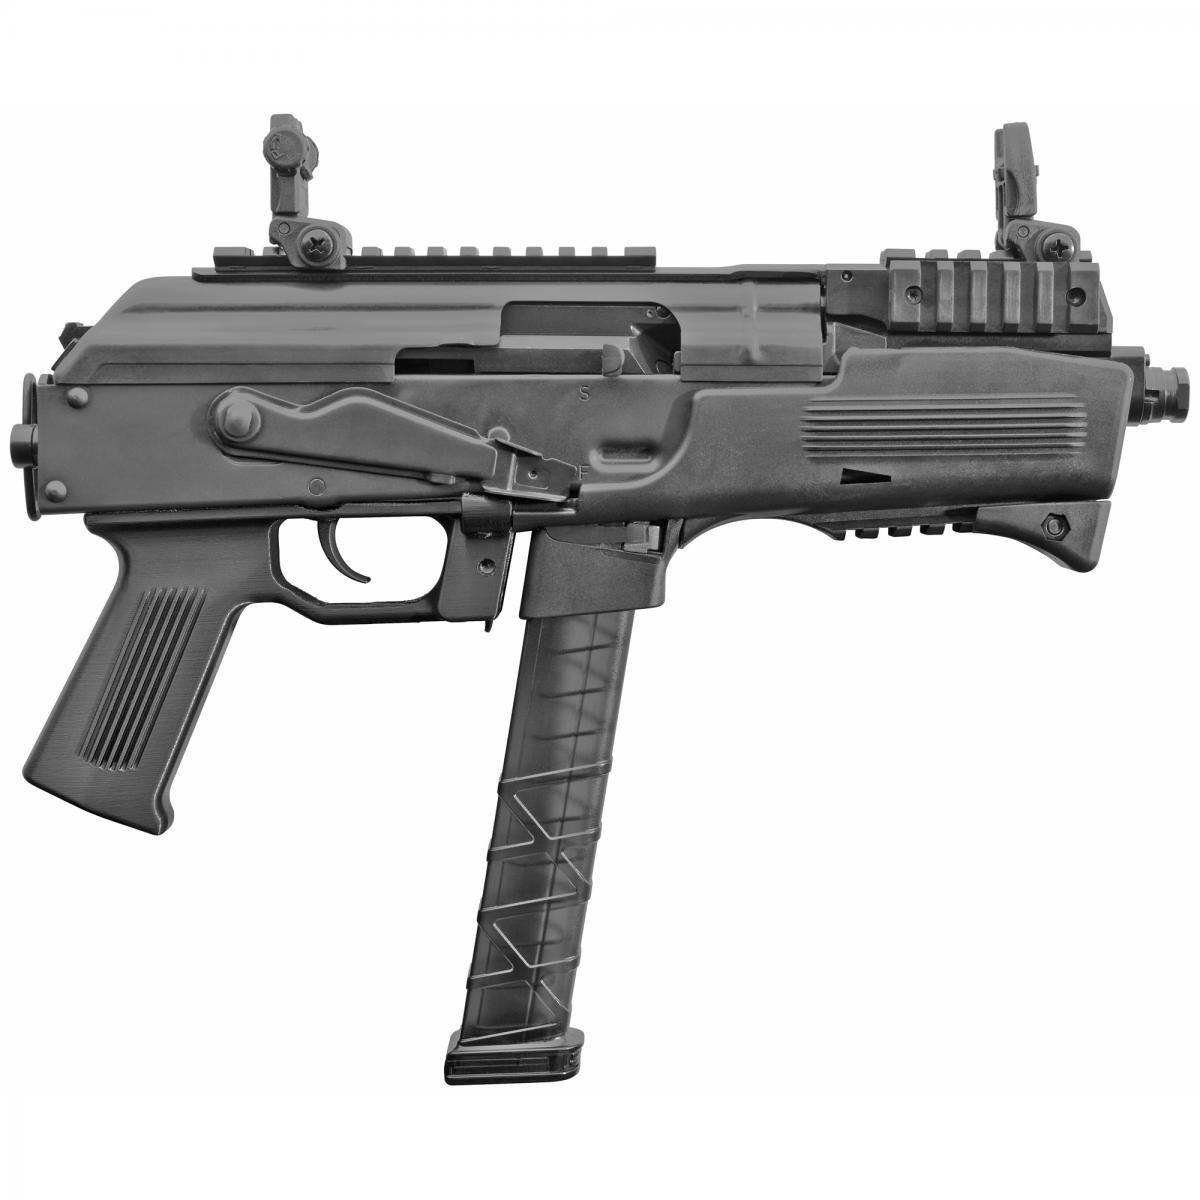 Charles Daly Chiappa PAK-9 9mm 8053800943147